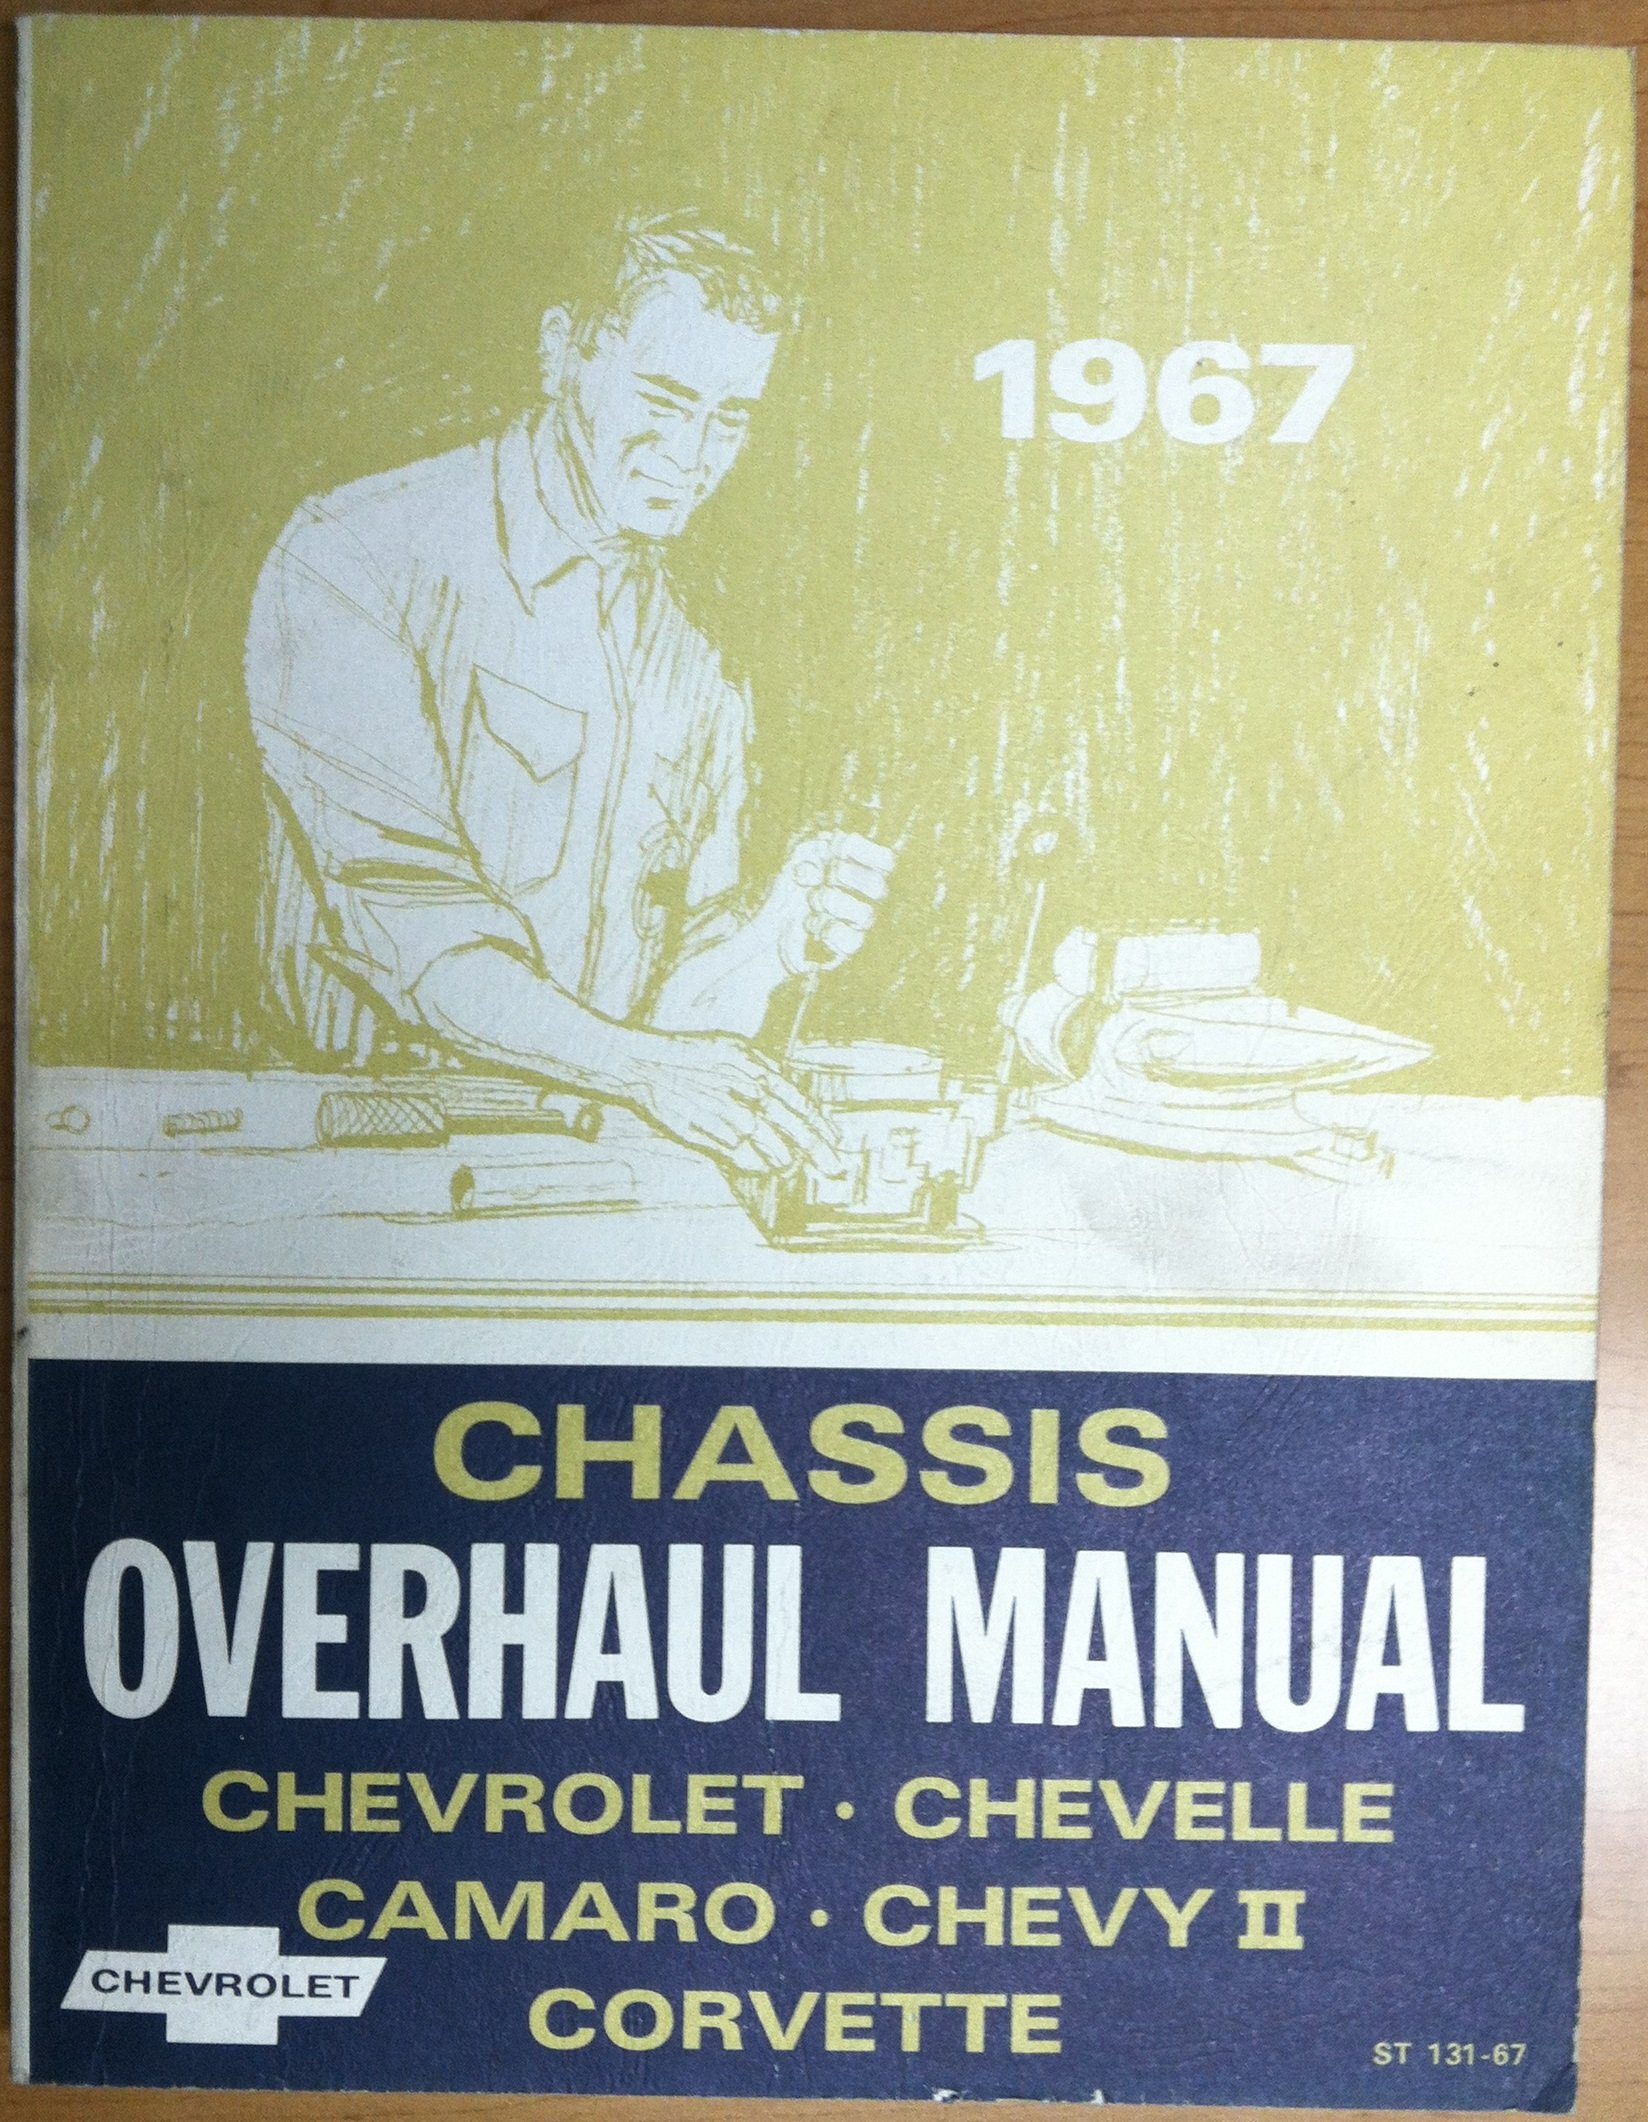 1967 Chassis Overhaul Manual - Chevrolet - Chevelle - Camaro - Chevy II -  Corvette (ST 131-67): staff: Amazon.com: Books